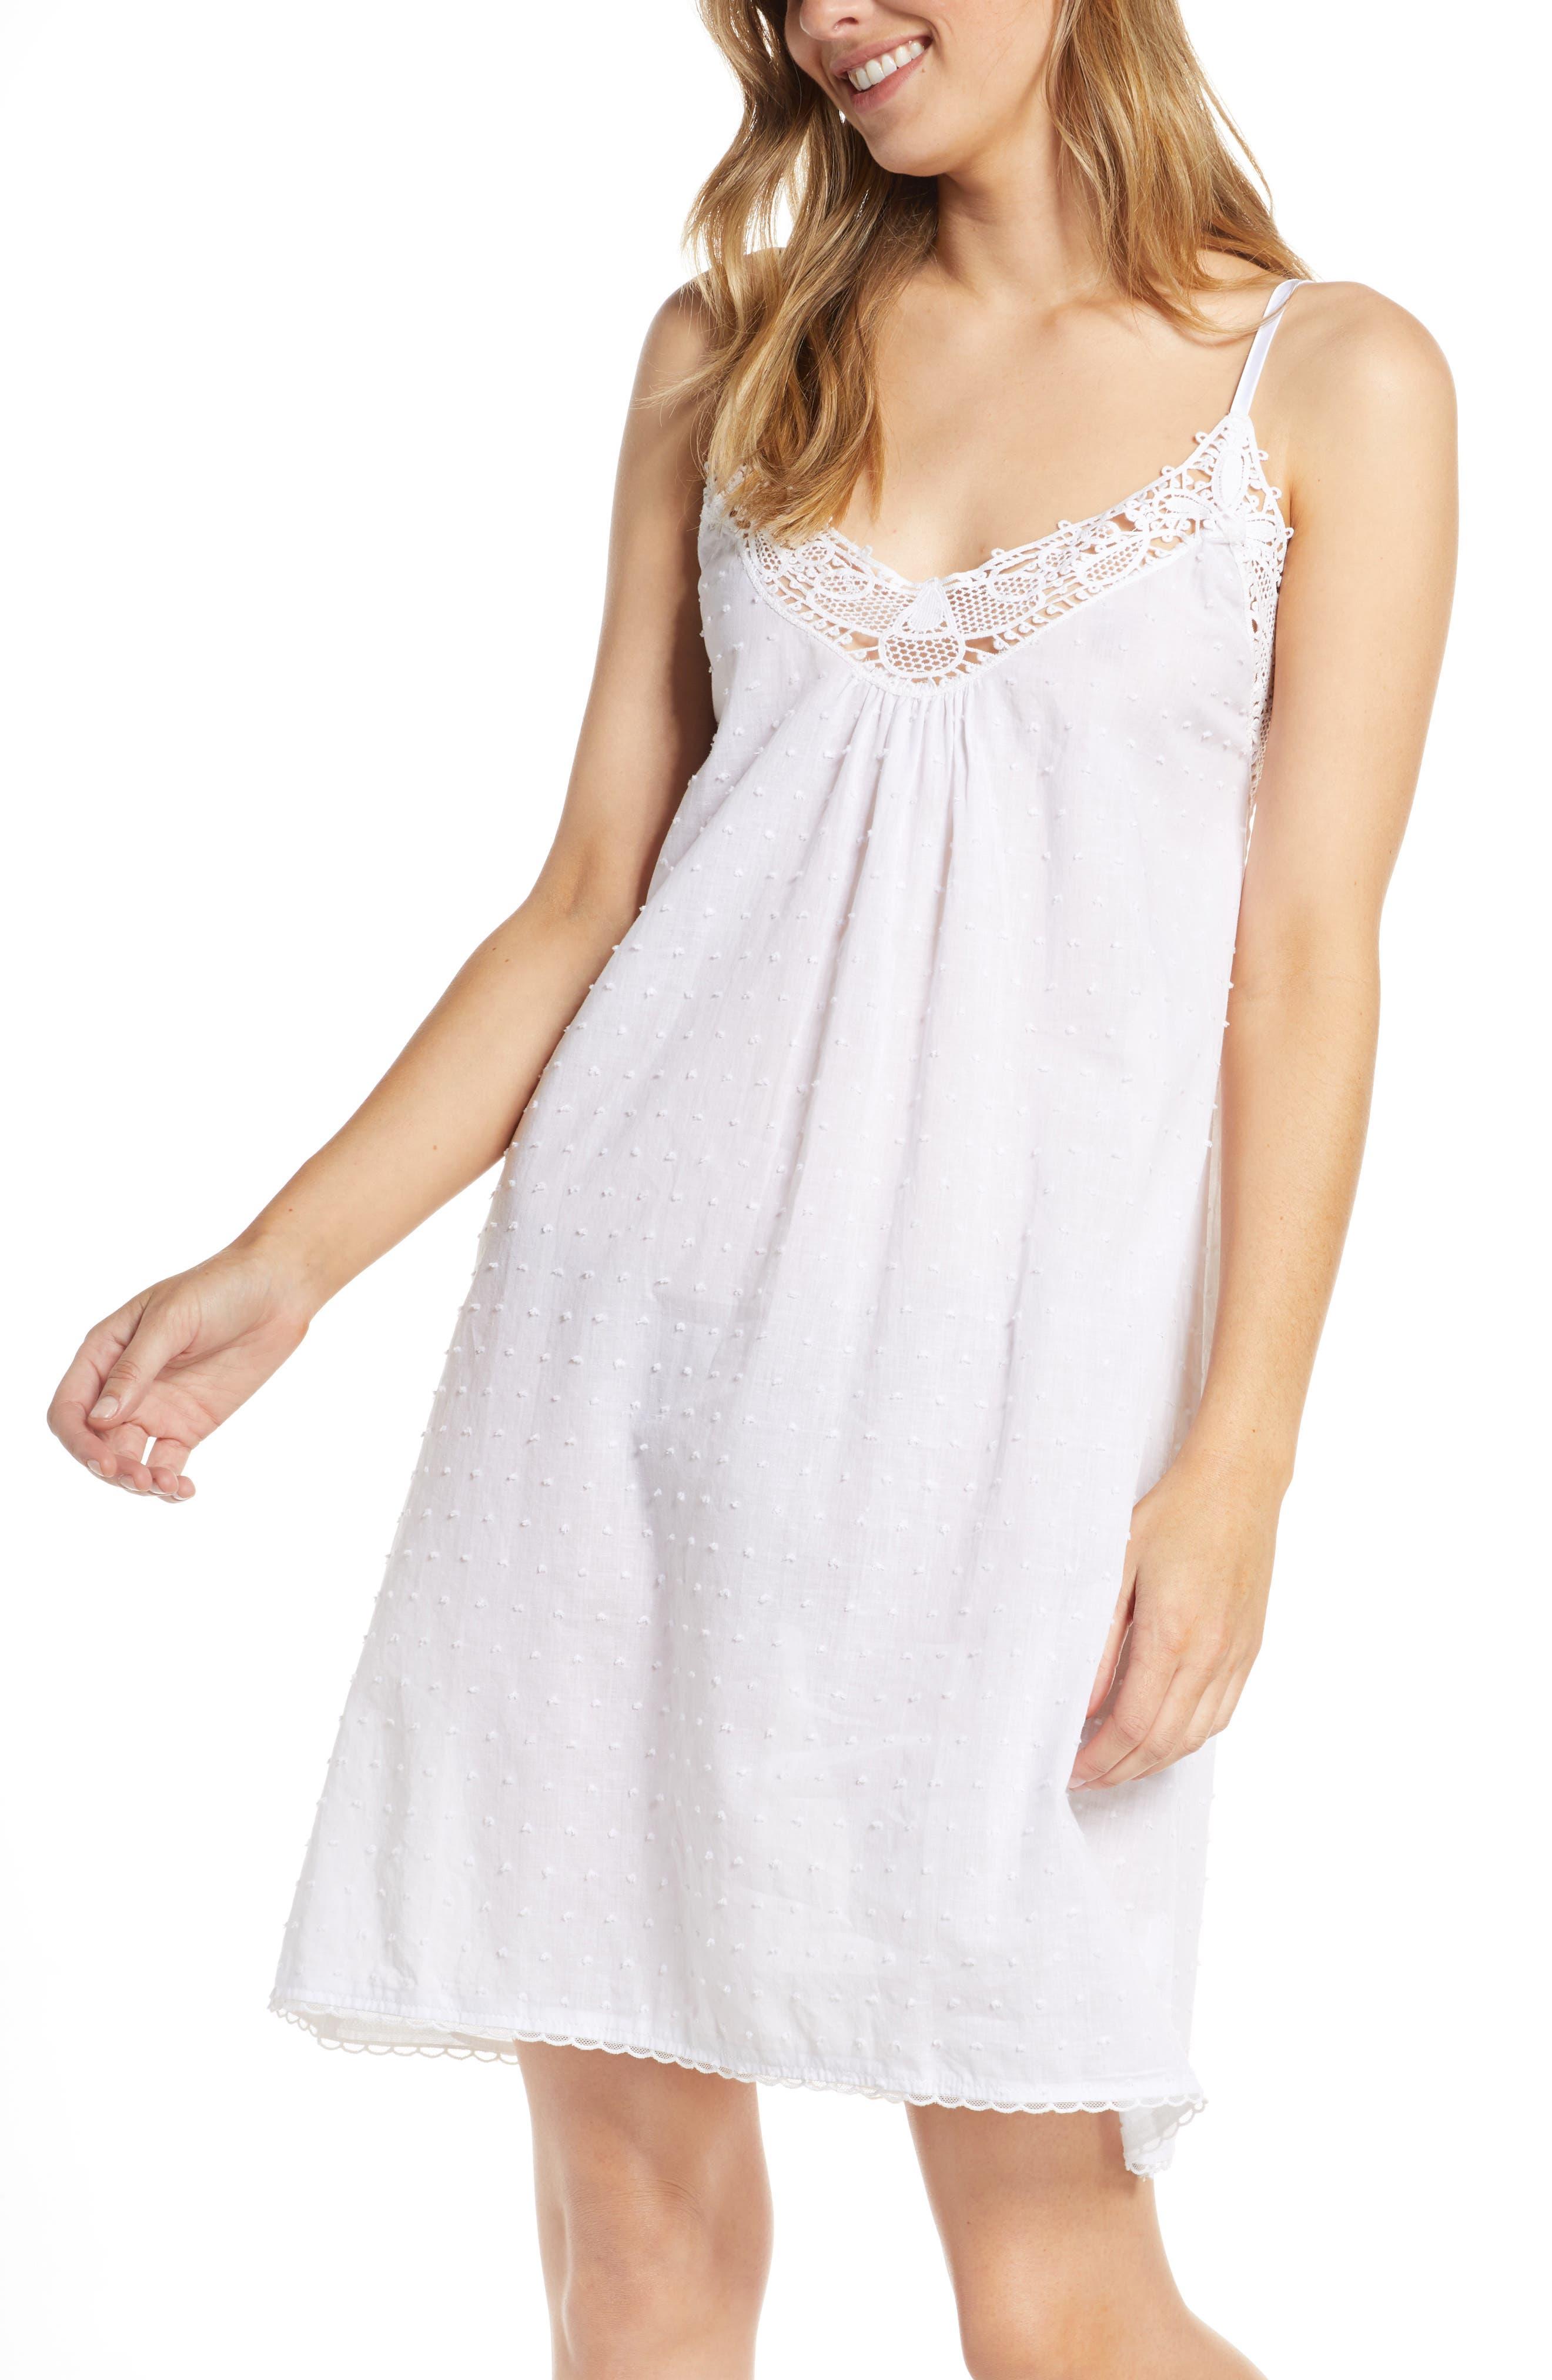 1920s Style Underwear, Lingerie, Nightgowns, Pajamas Womens Papinelle Swiss Dot Lace Trim Chemise $59.00 AT vintagedancer.com